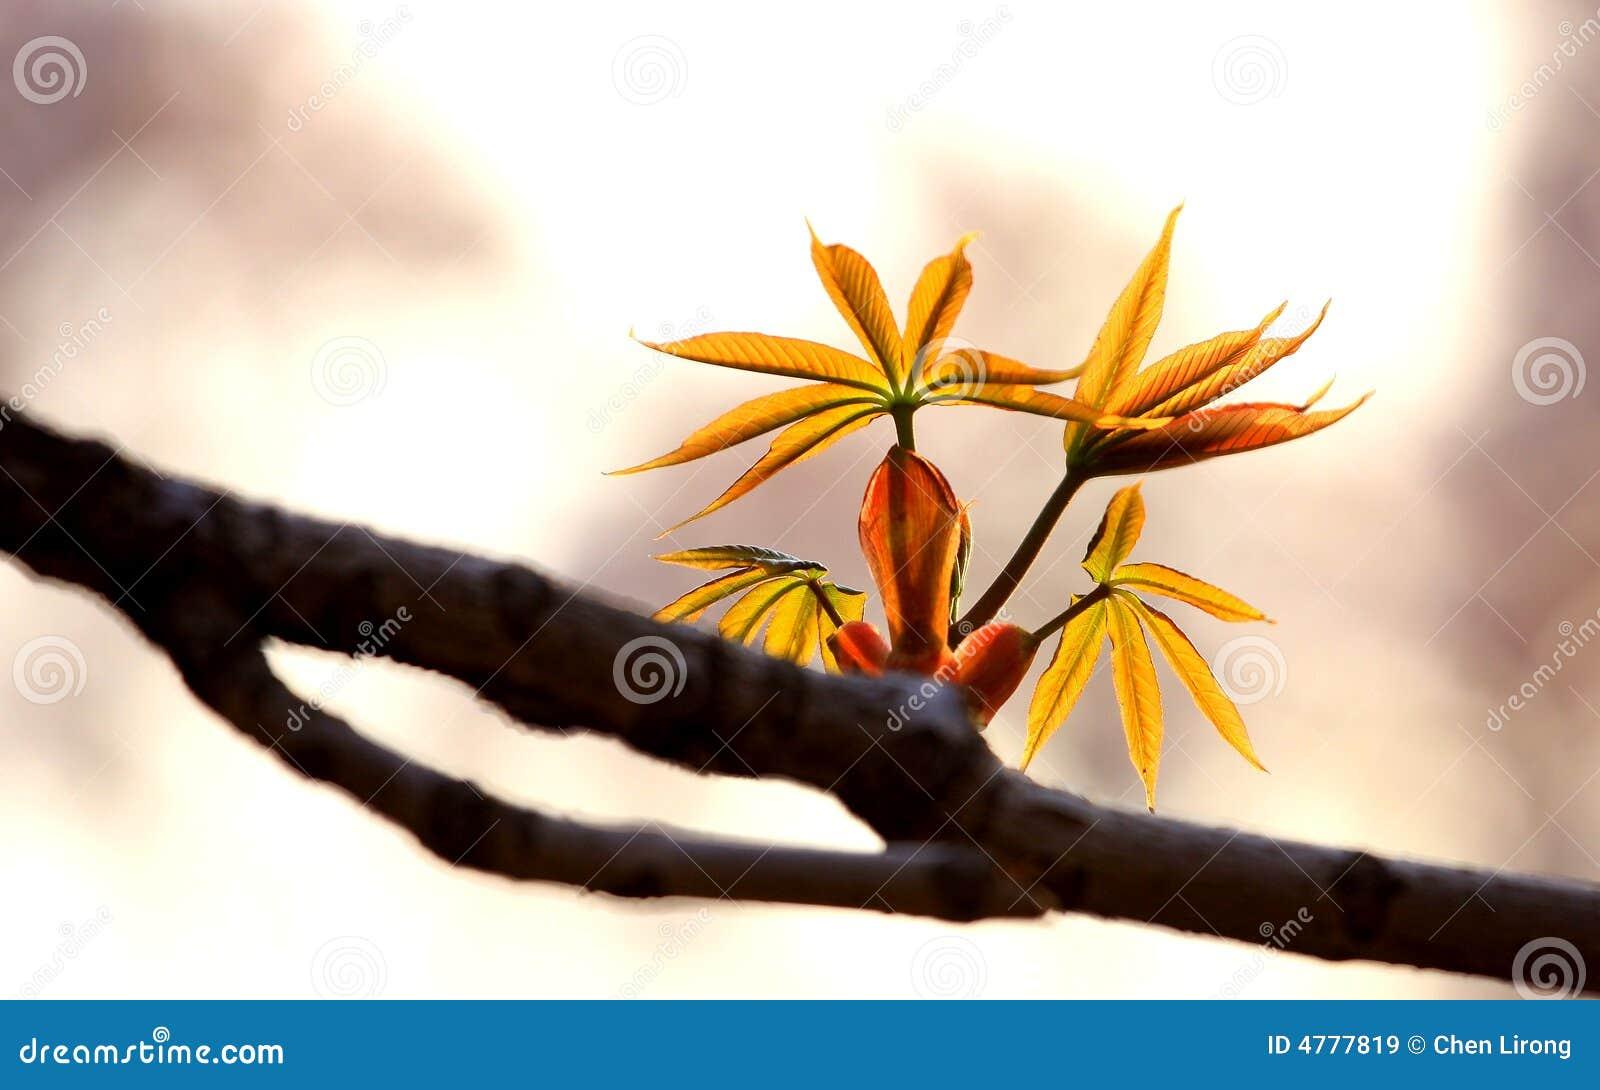 Twig_on_spring_tree